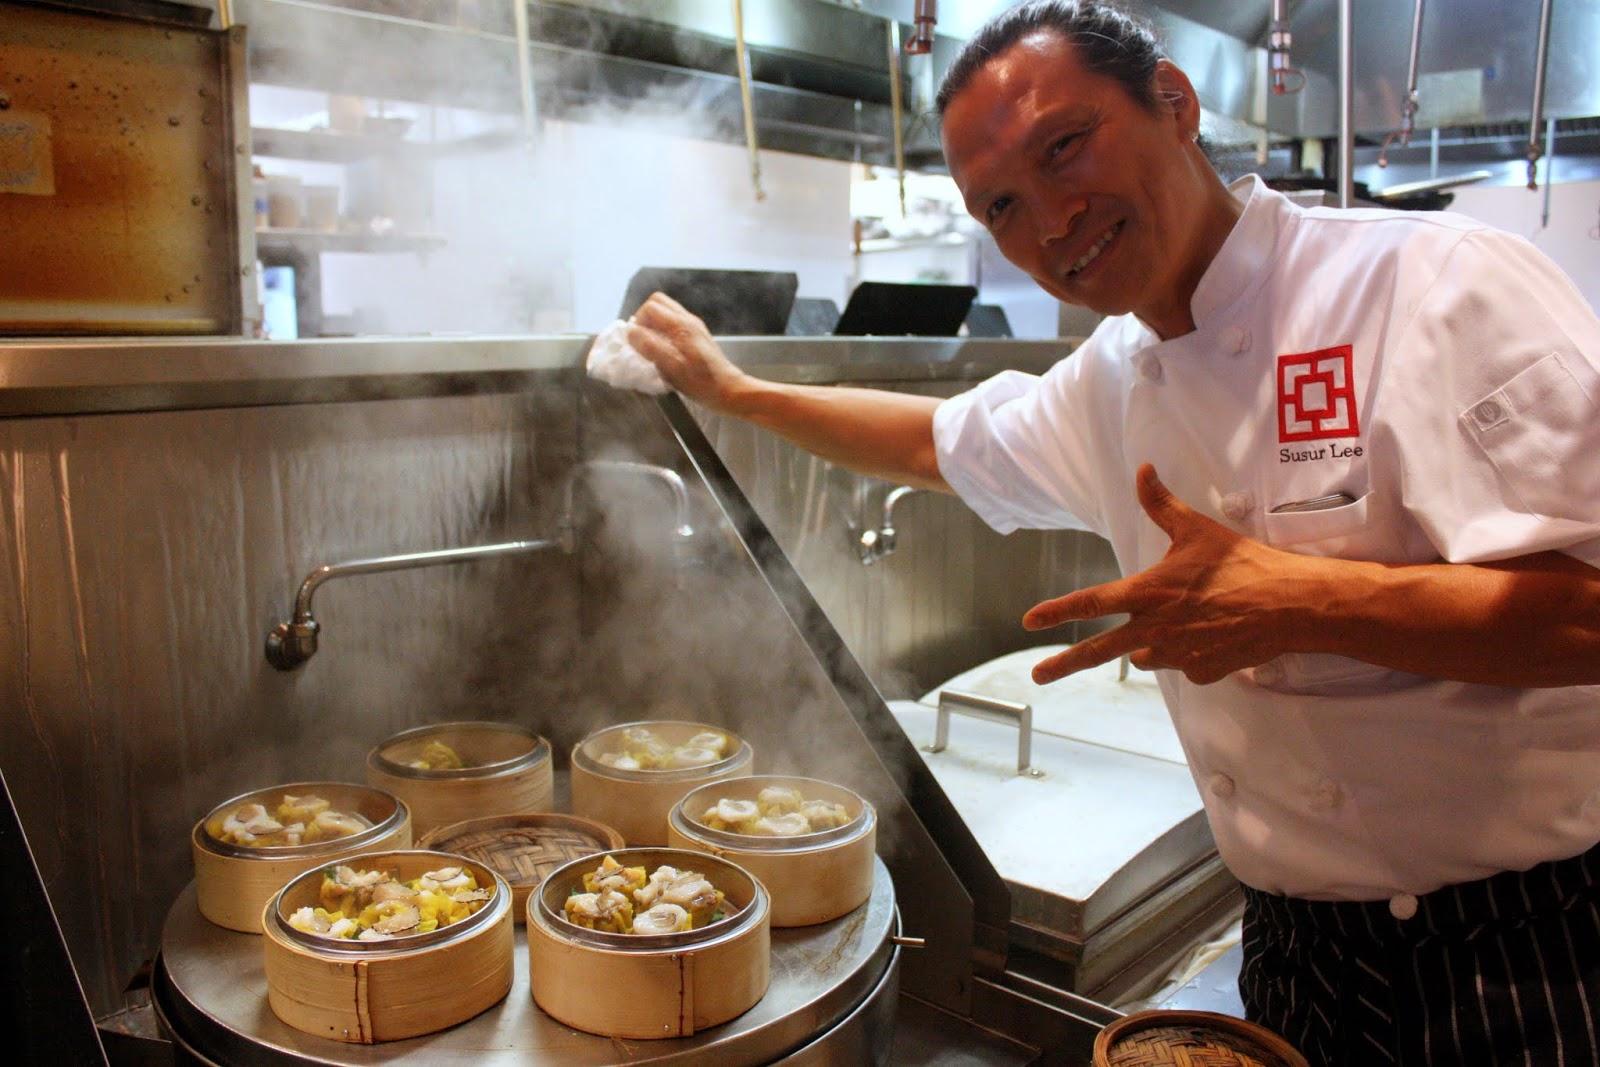 Restaurant Roundup  Torontos King West Neighbourhood  Food Bloggers of Canada